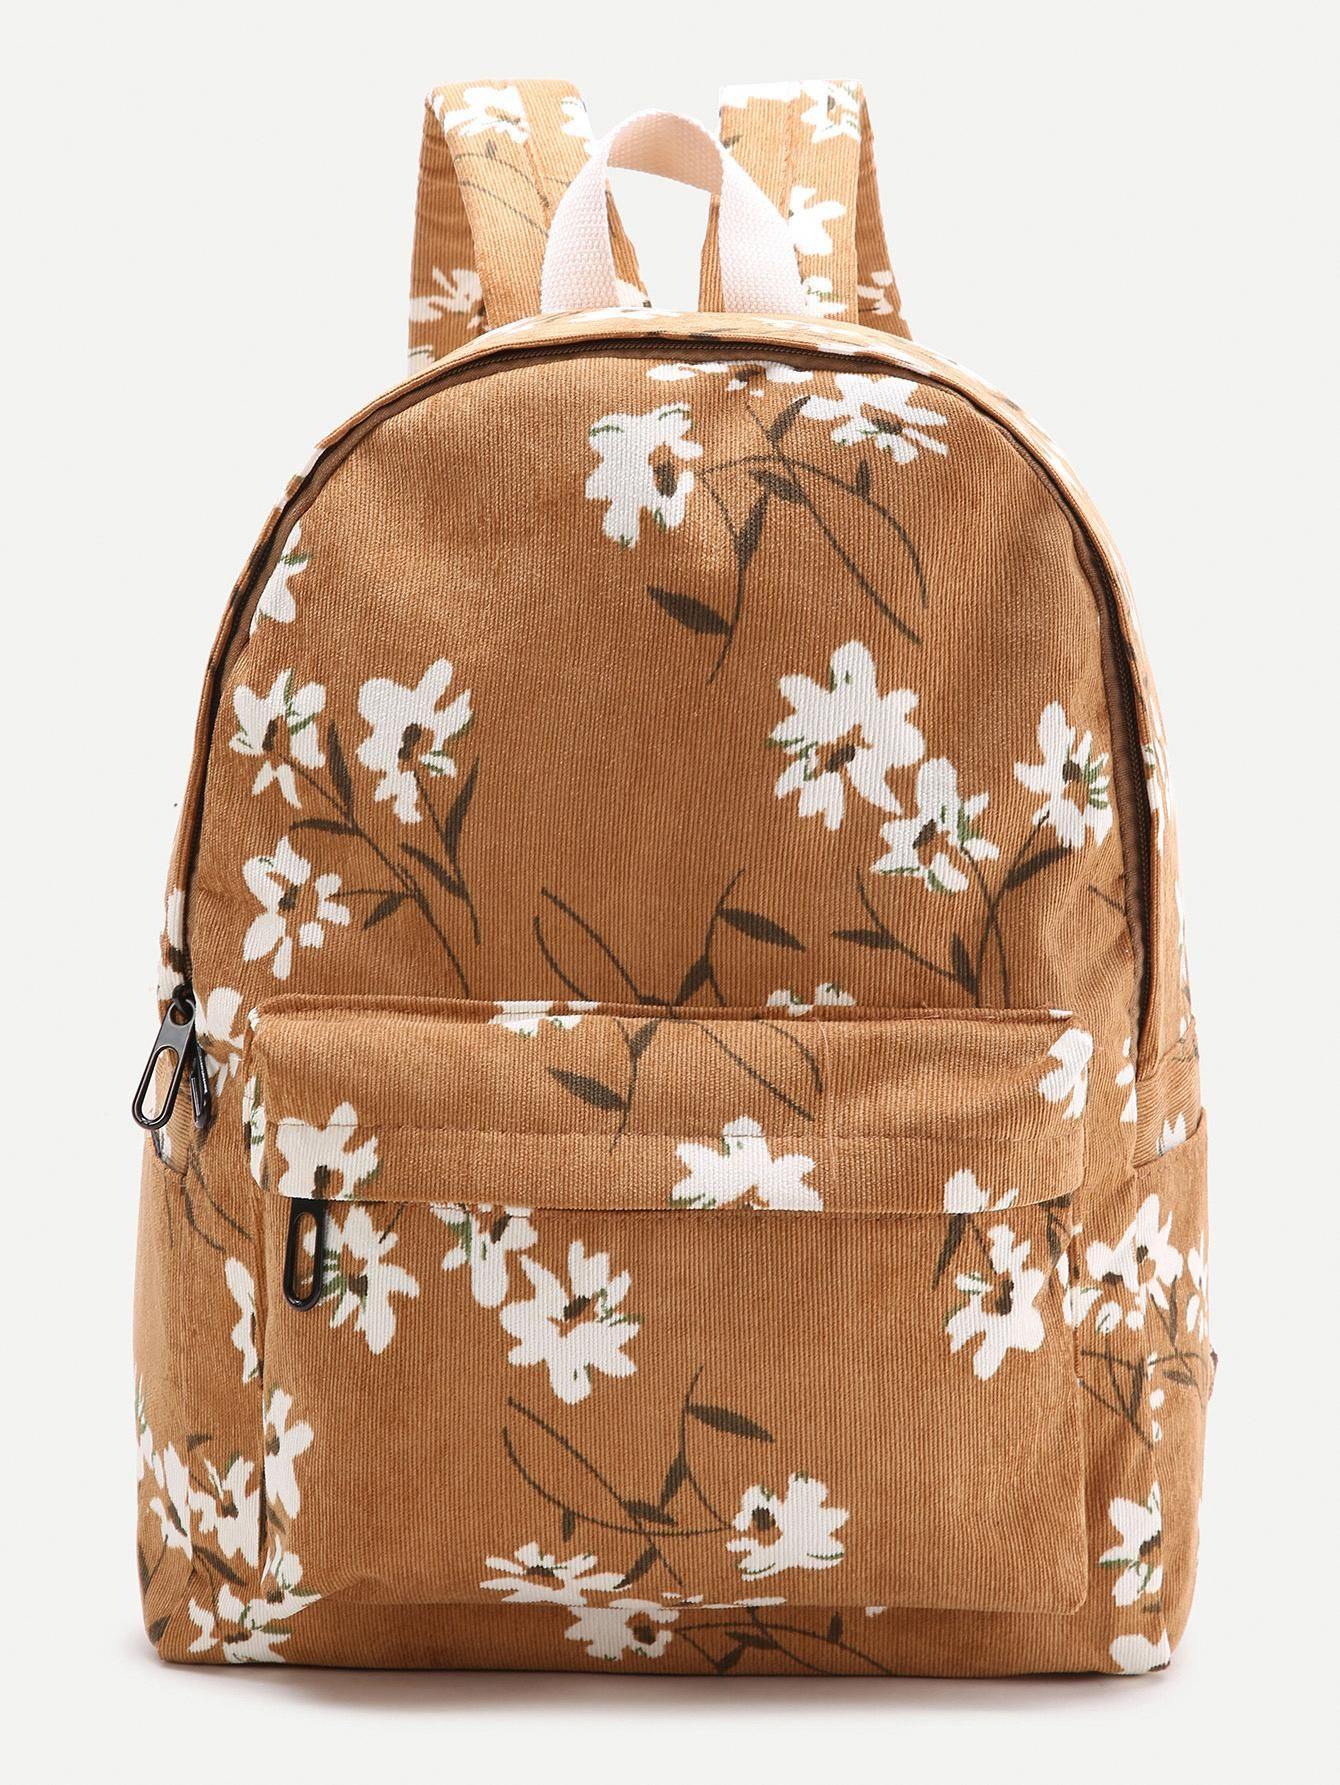 canvas backpacks #CanvasBackpackTips   Bolsas femininas